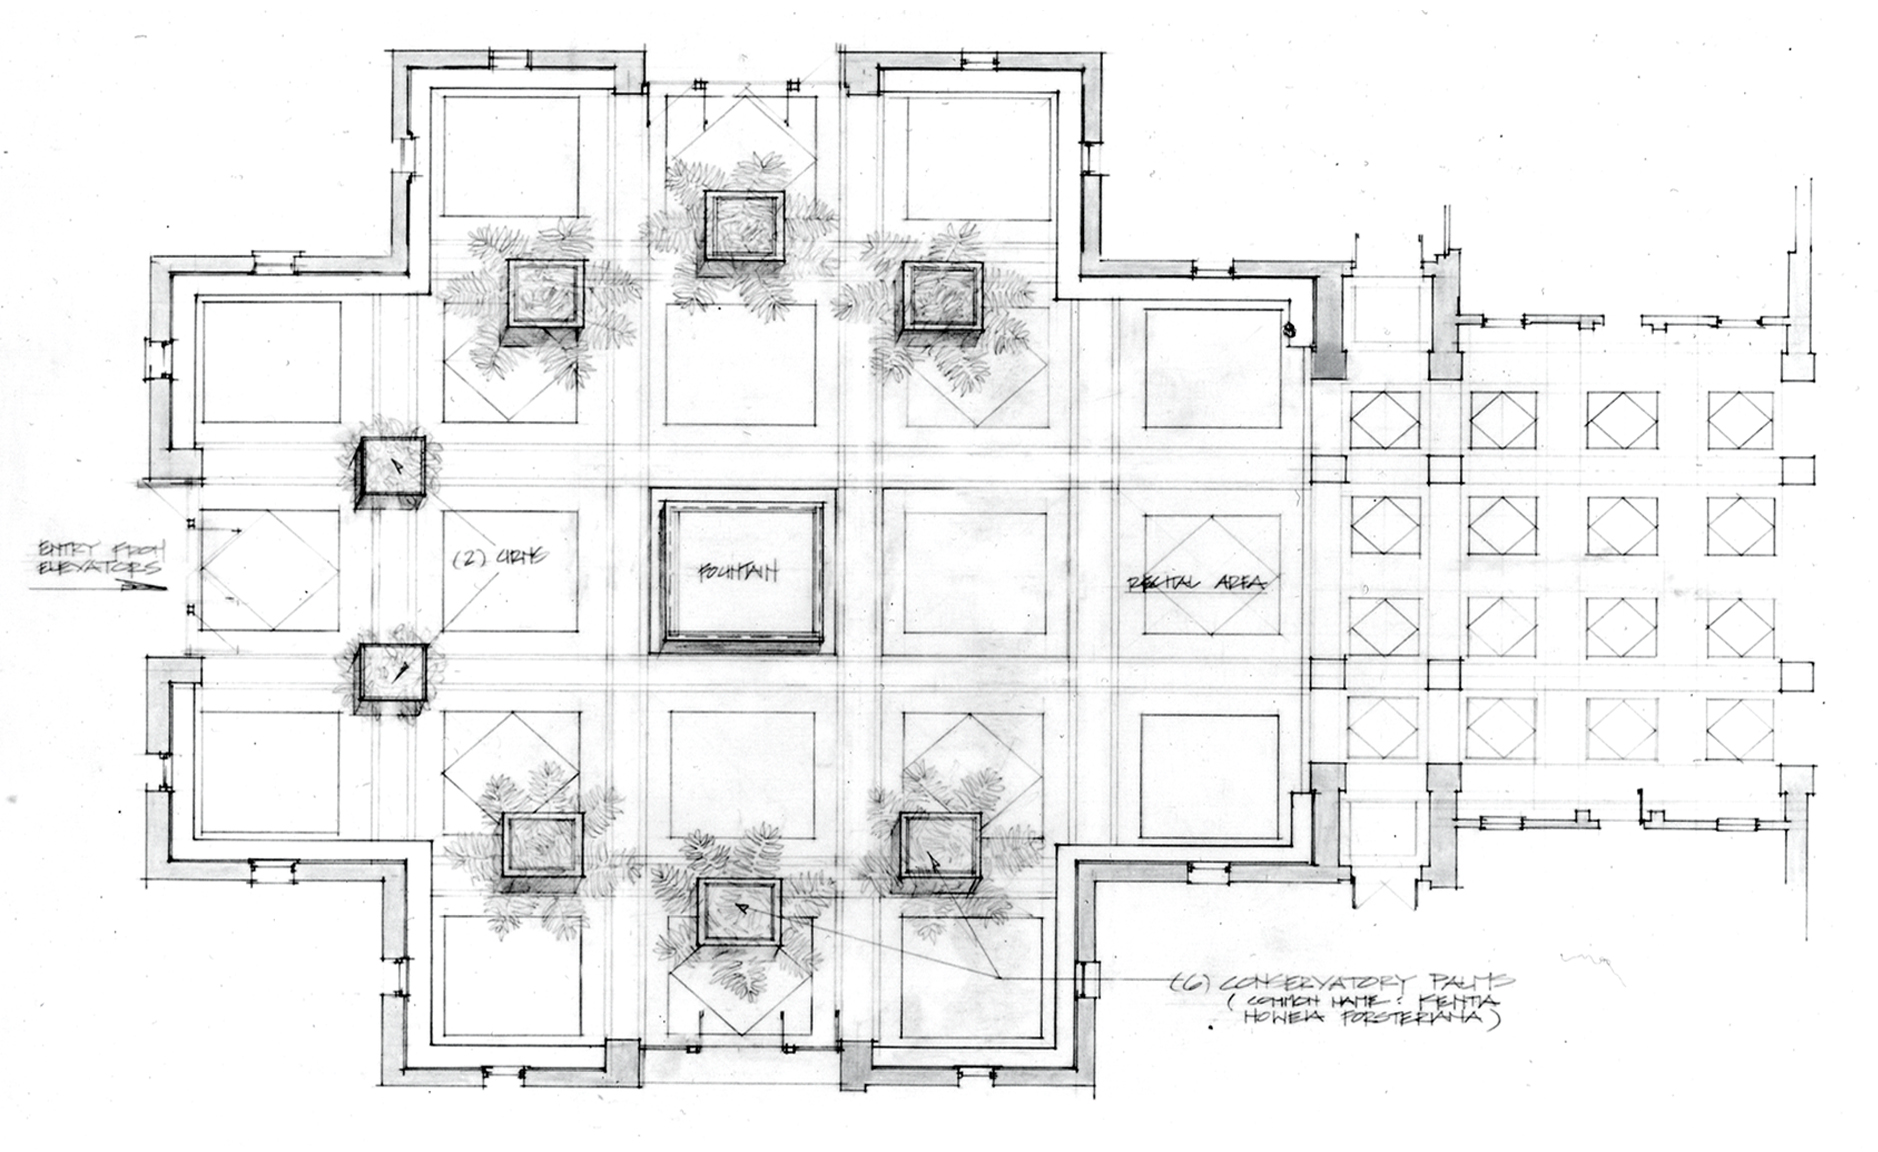 CONSERVATORY HAROLD WASHIGHTON LIBRARY 01.jpg